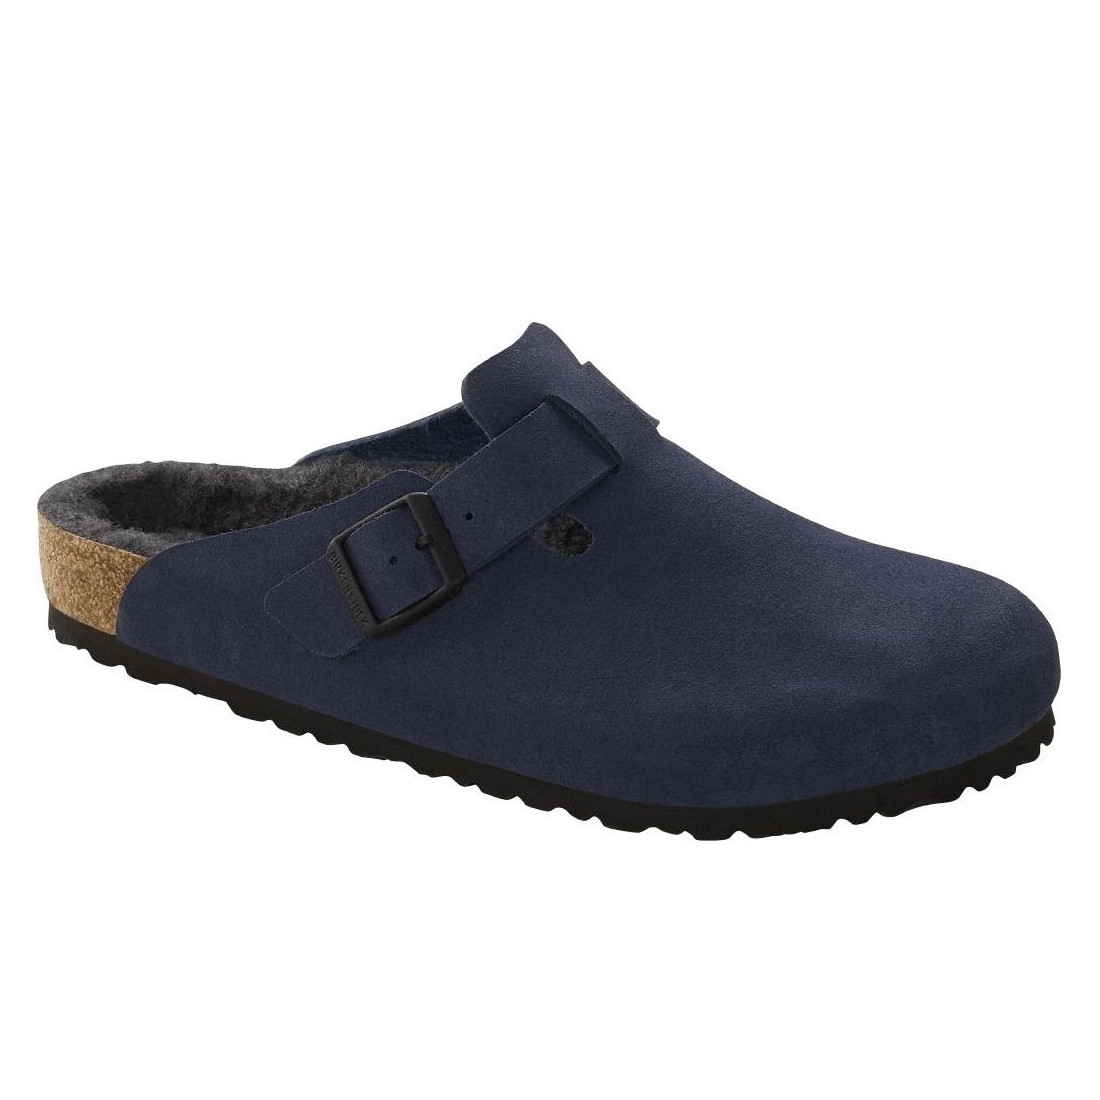 sandals man birkenstock boston m1017475 8062